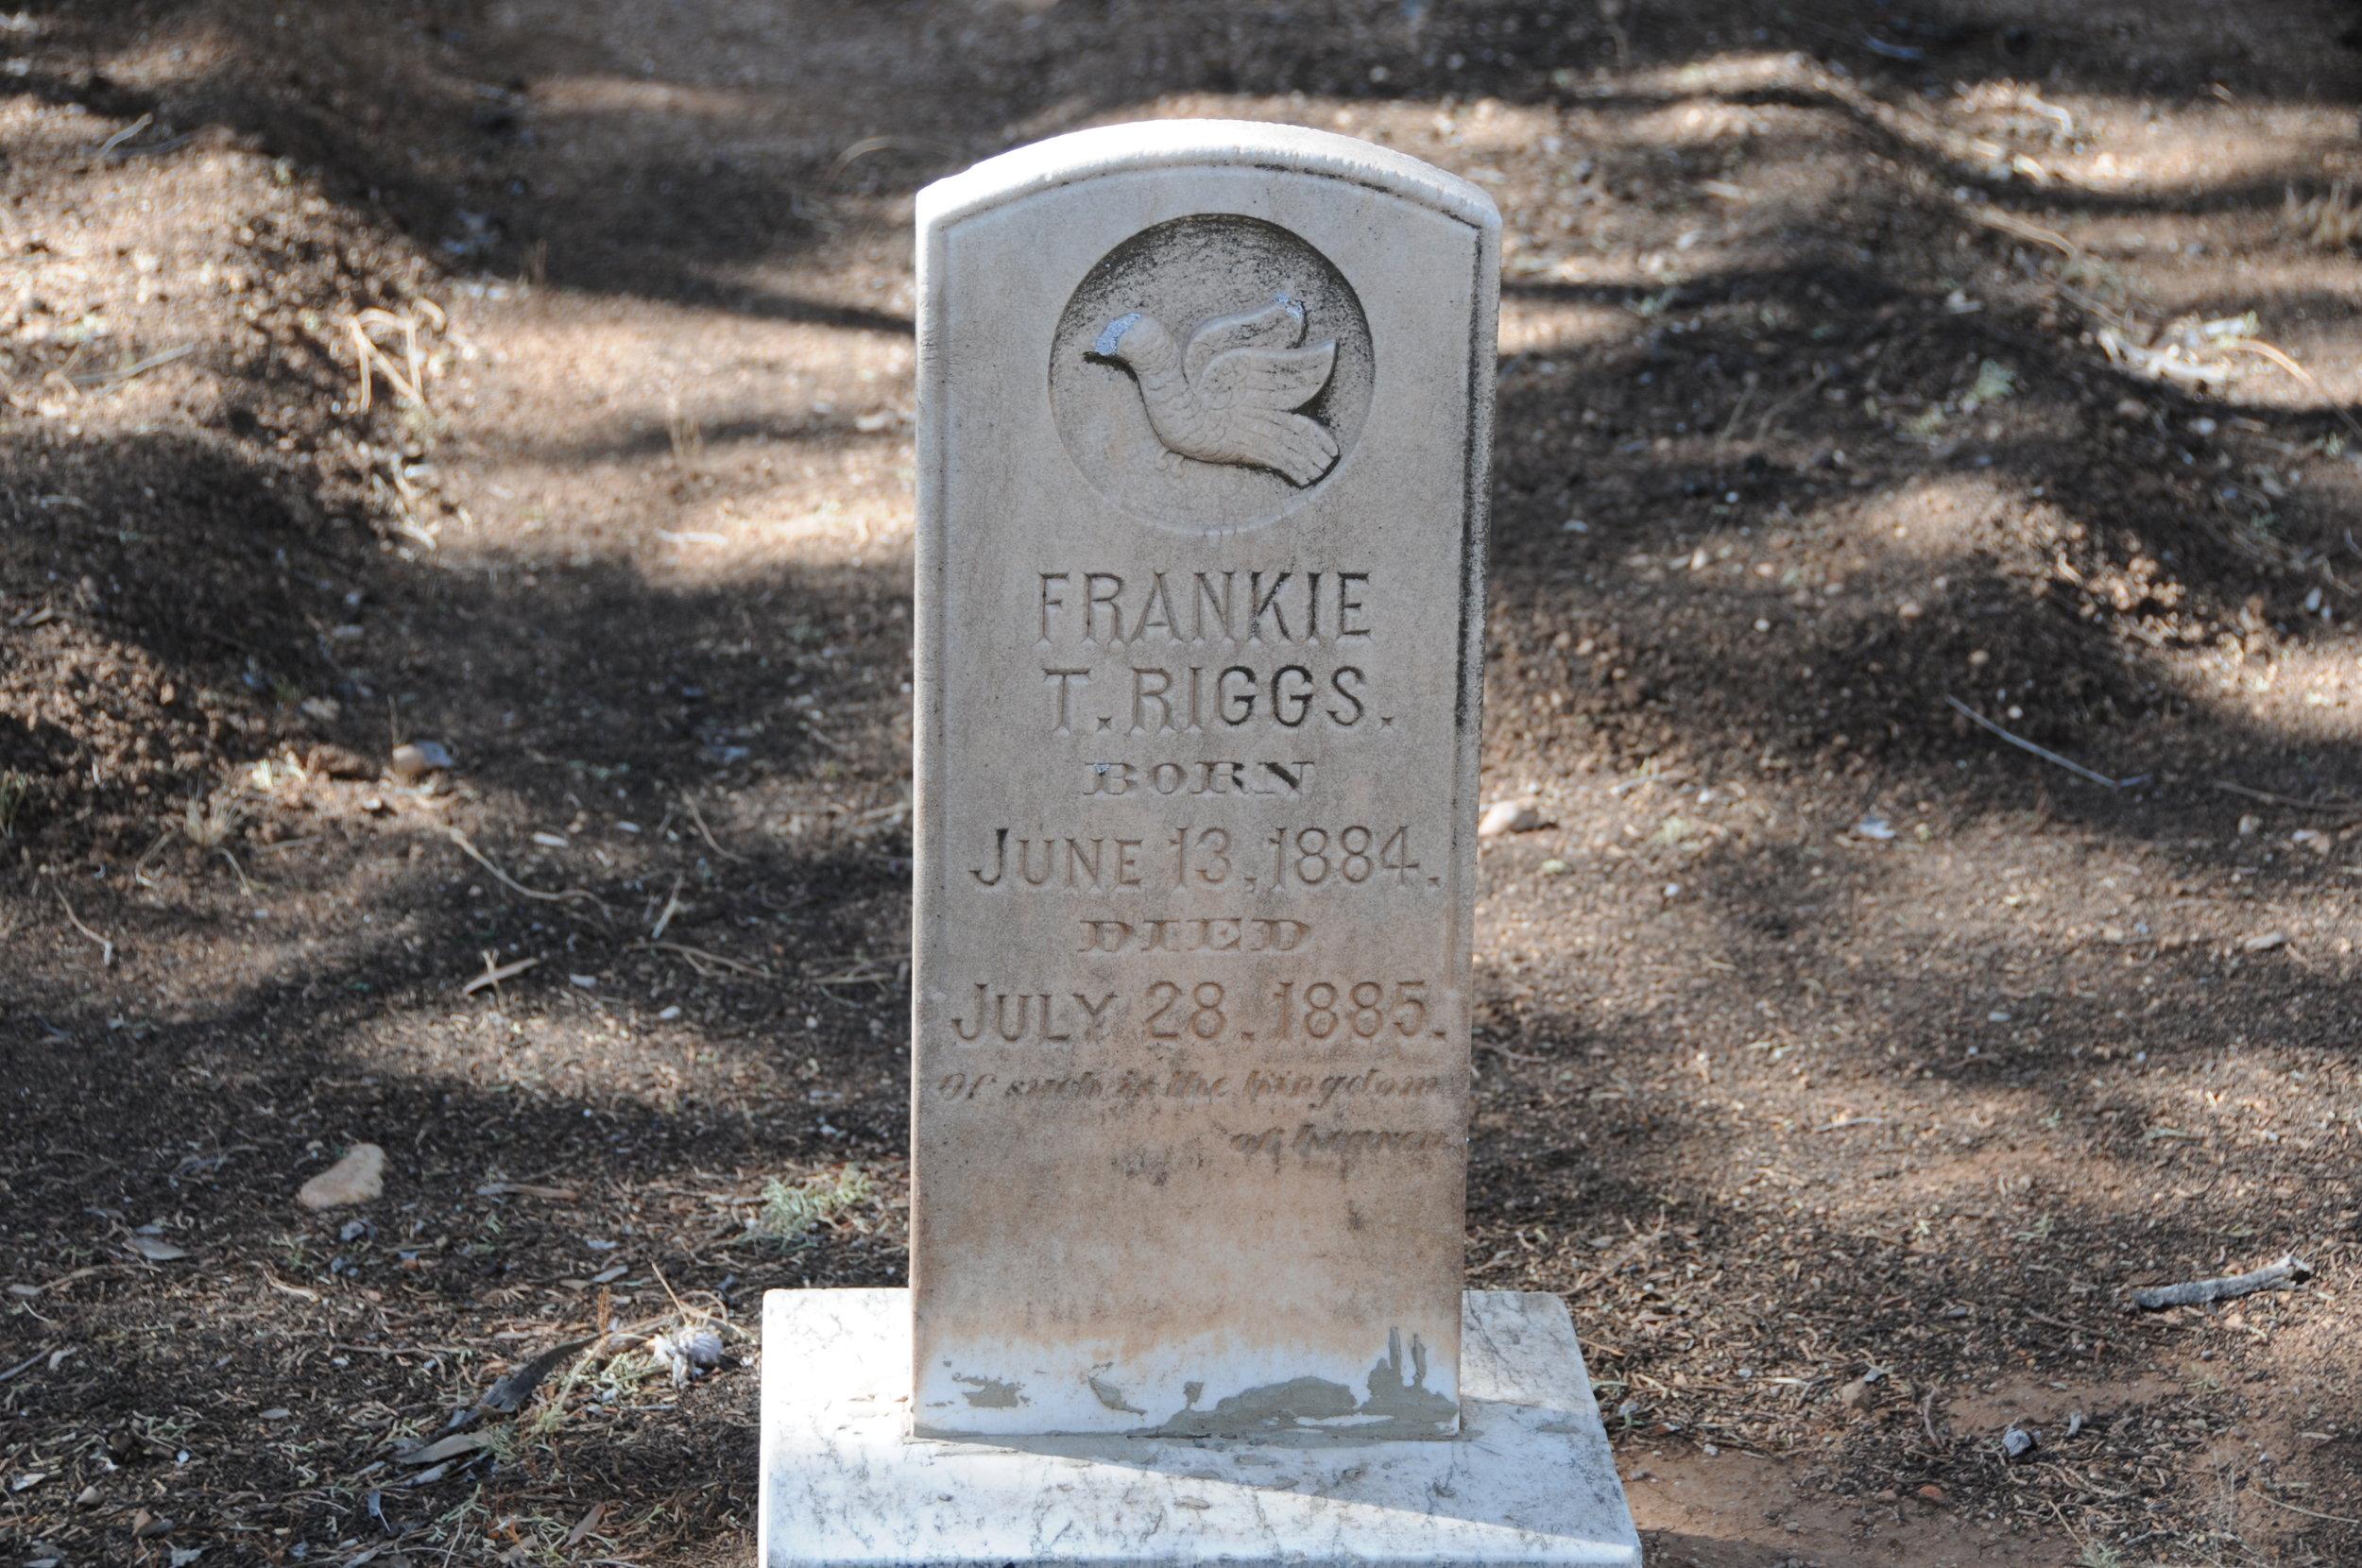 2h FRANKIE T. RIGGS